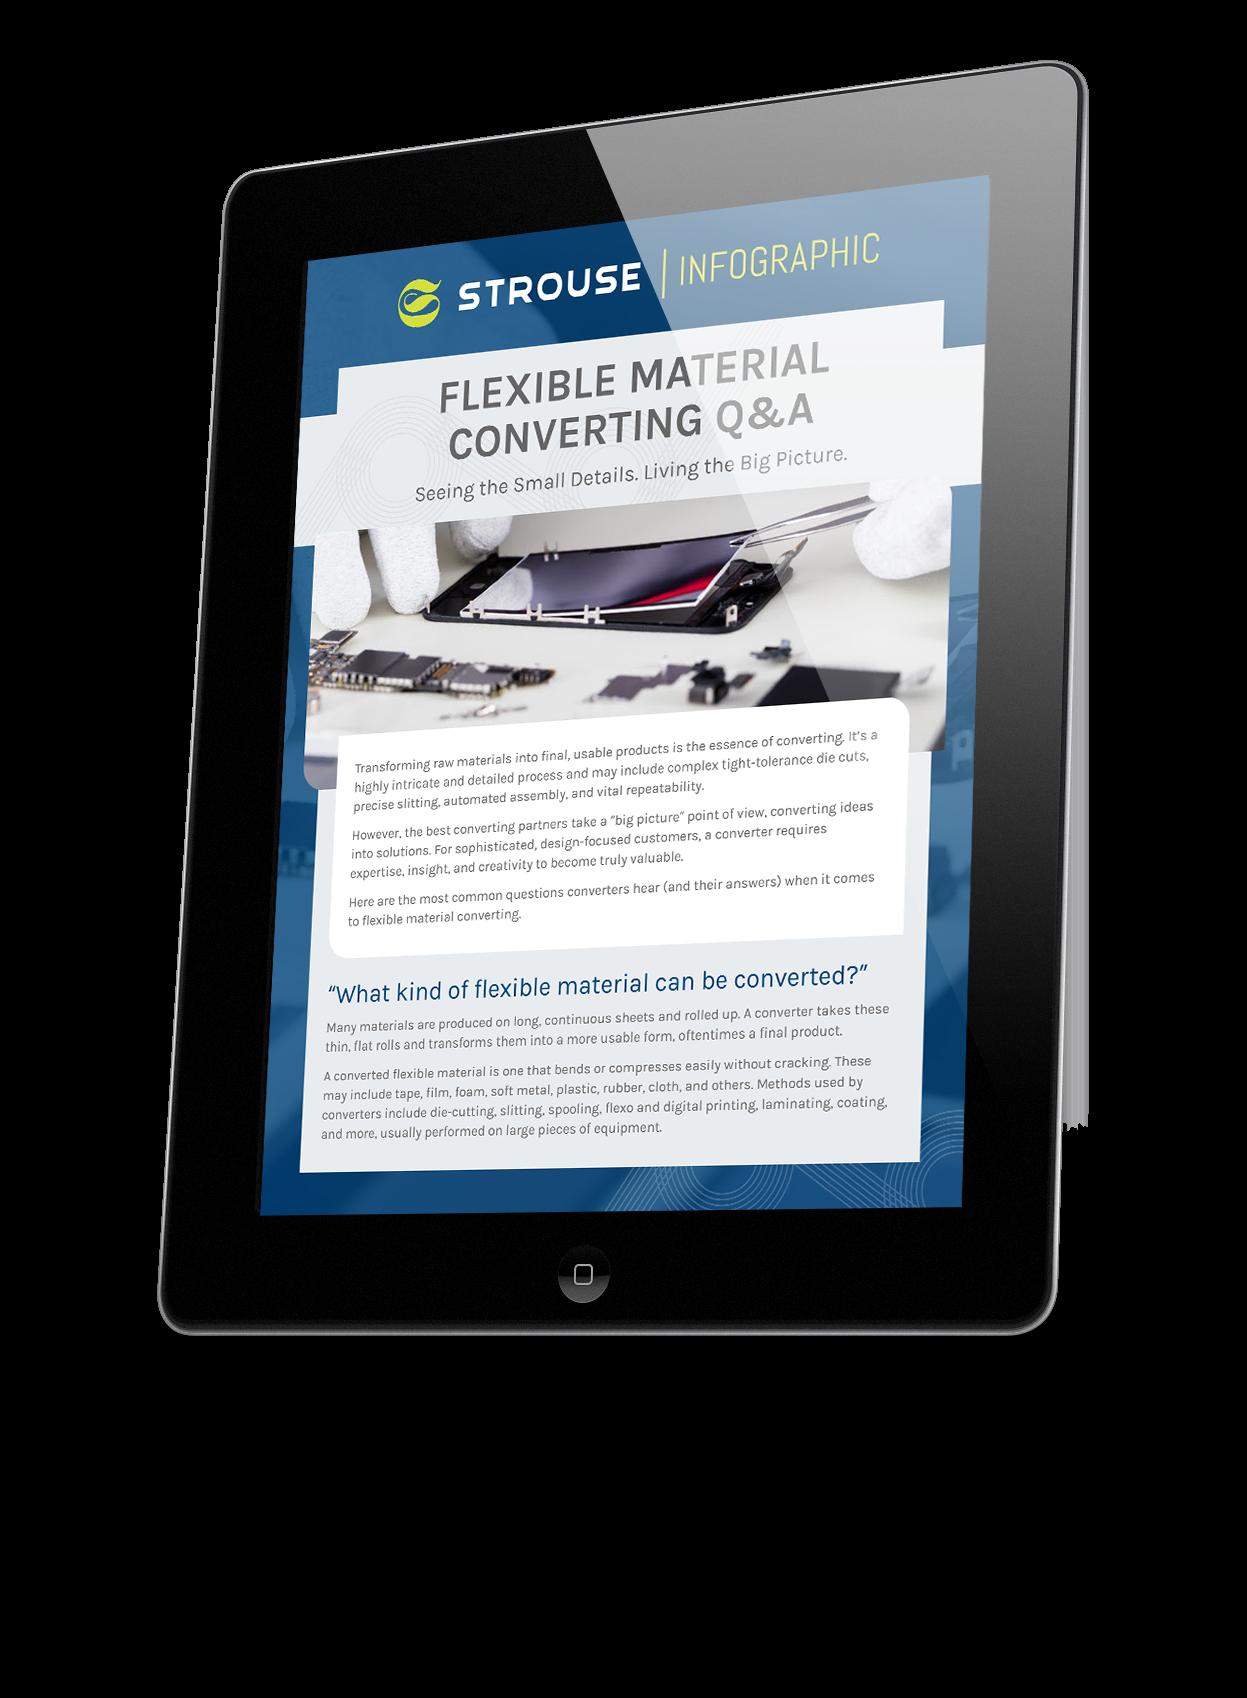 Flexible Material Converting Q & A on an iPad